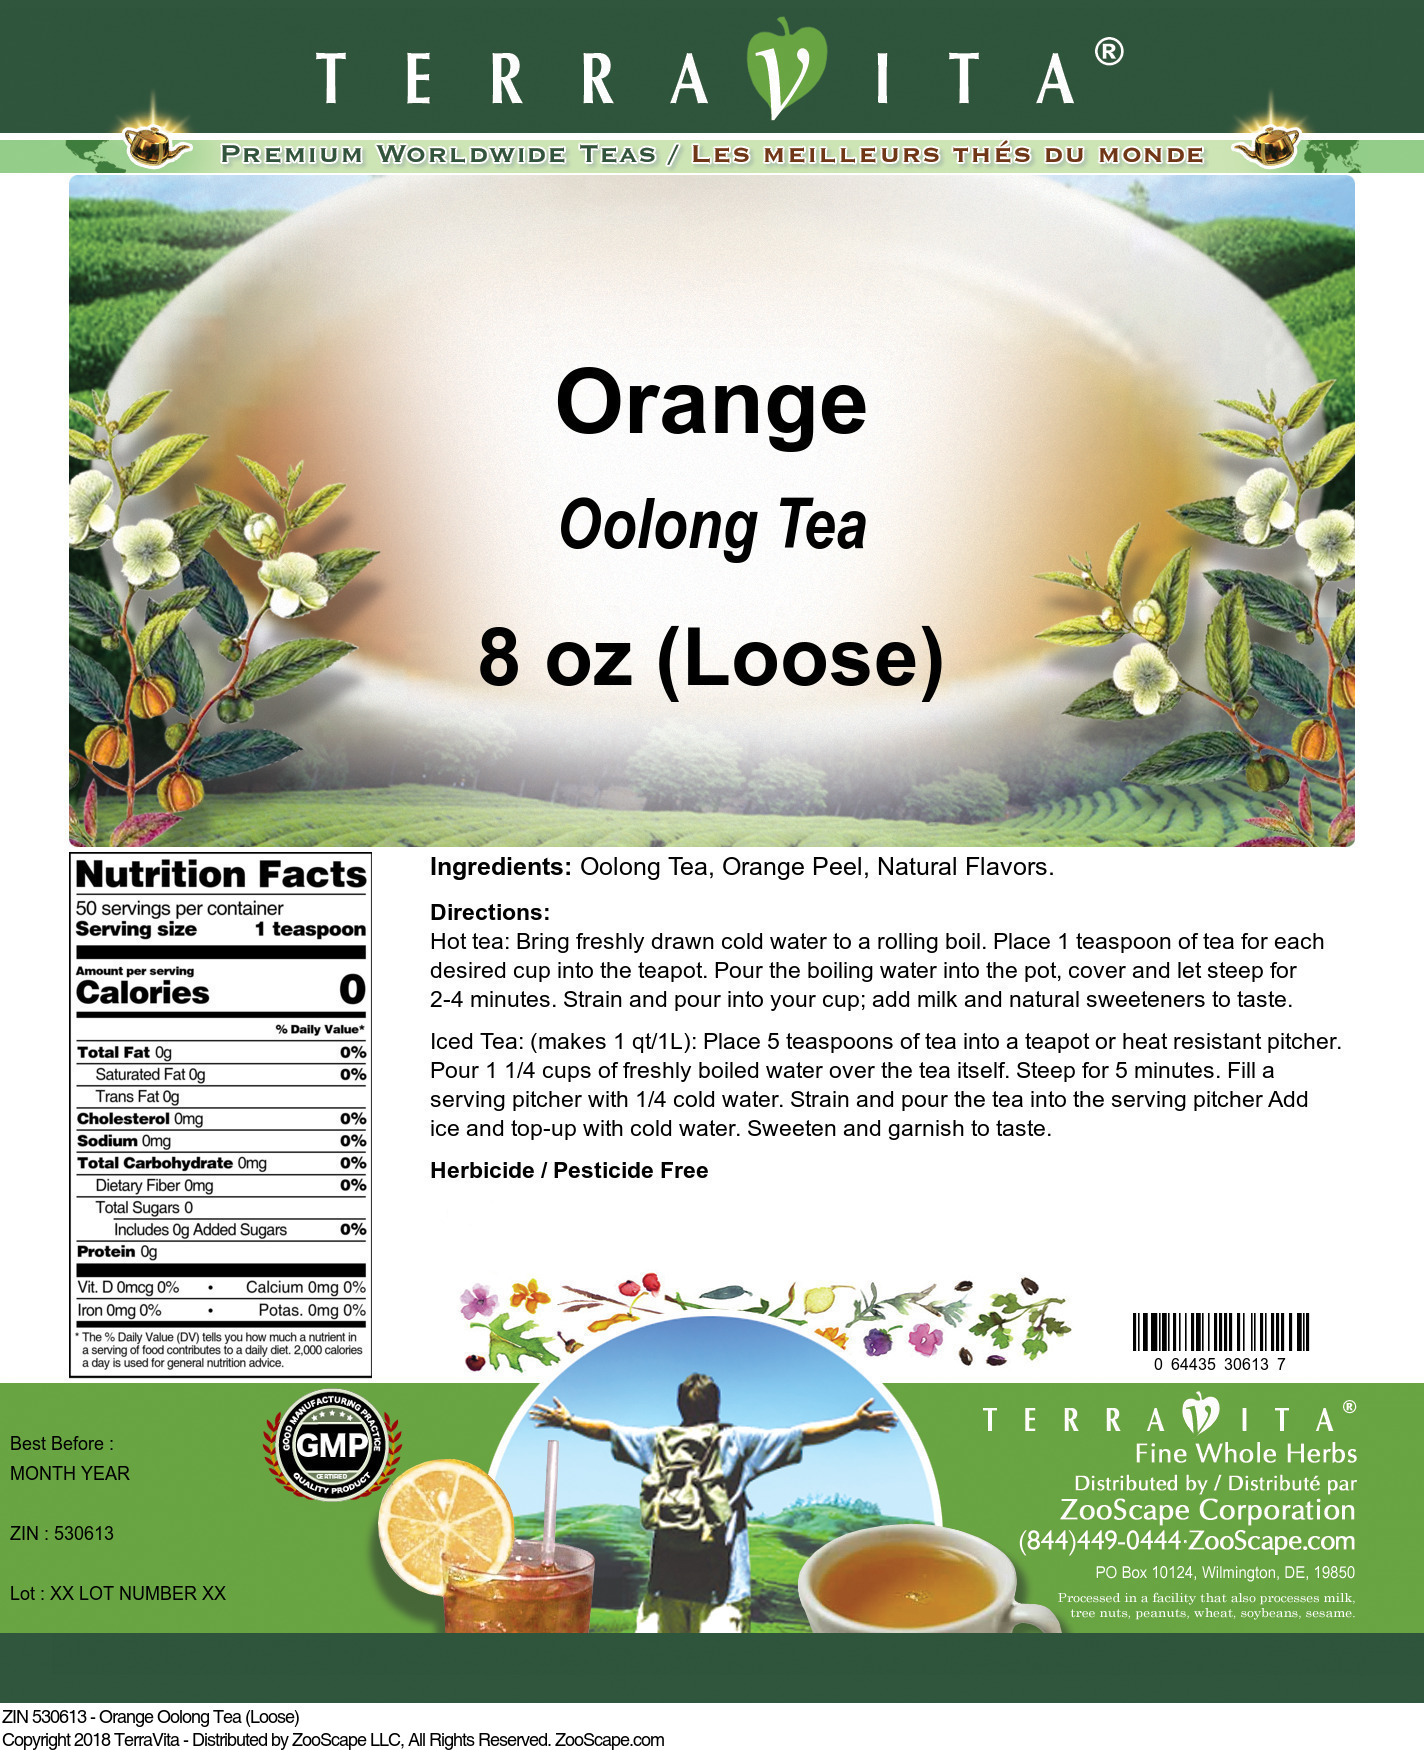 Orange Oolong Tea (Loose)